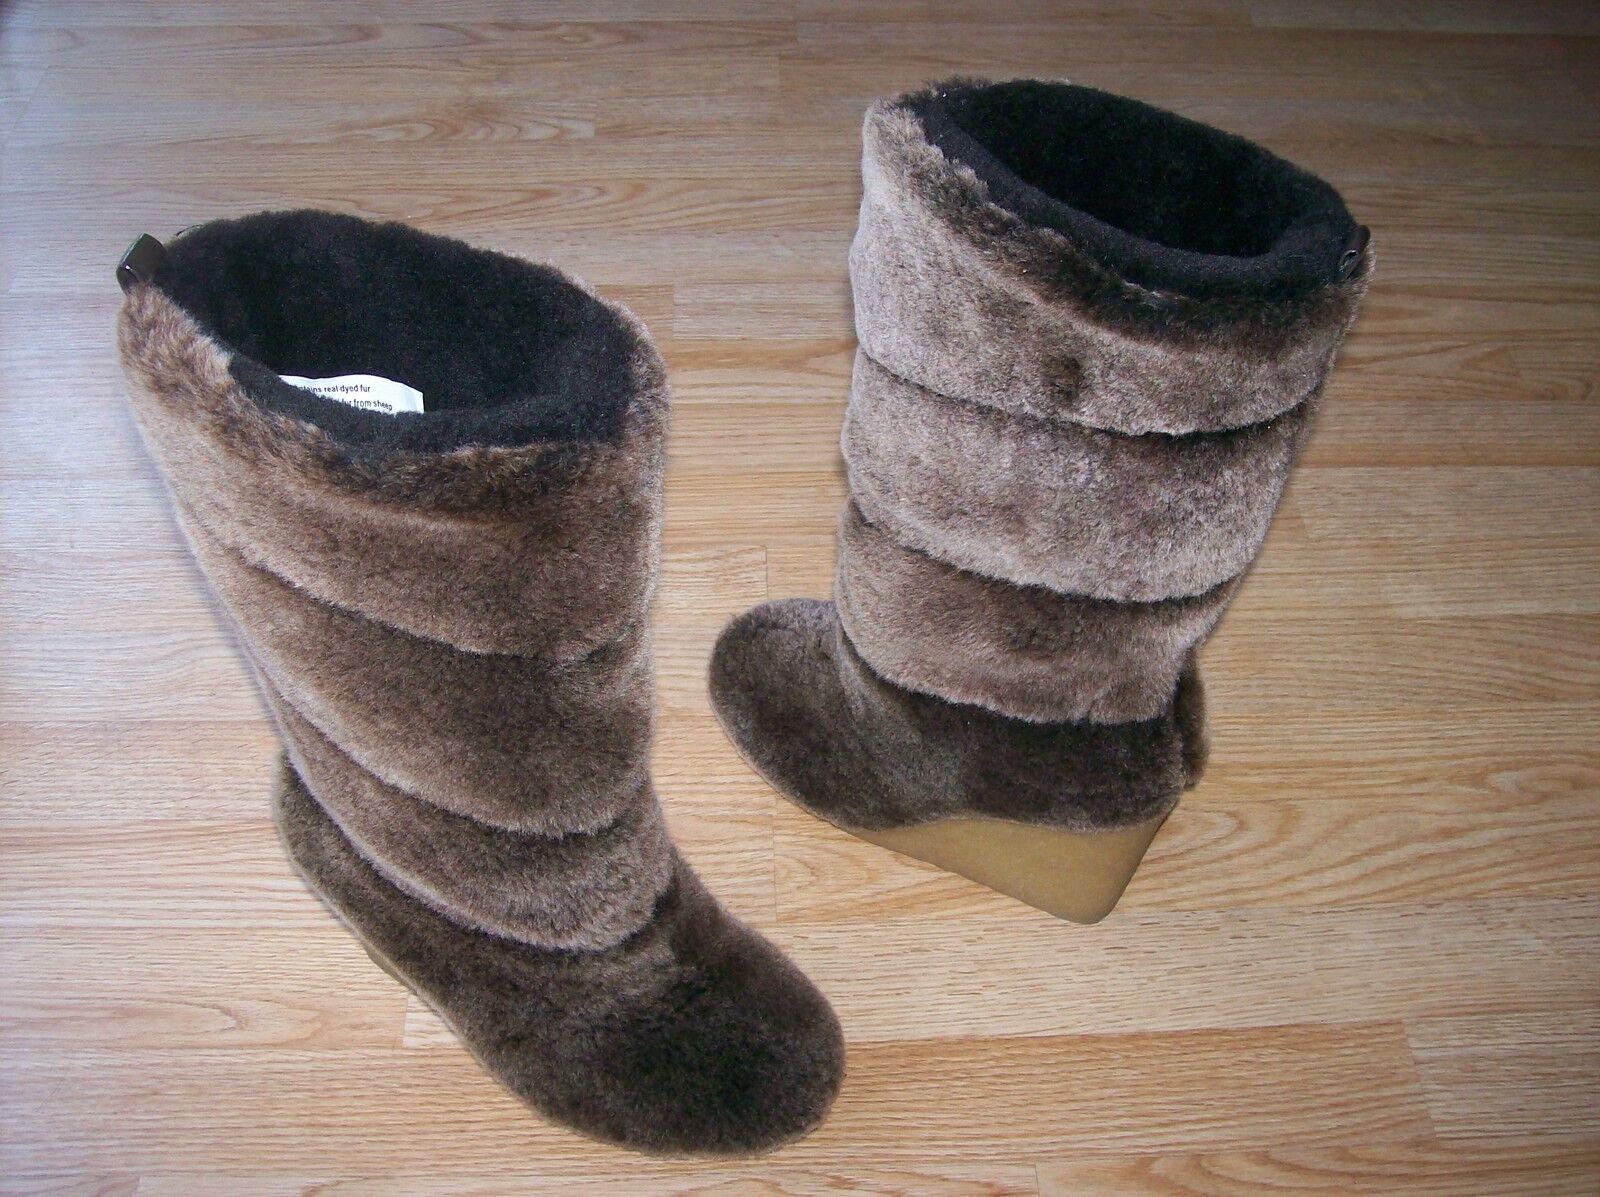 395 Tory Burch Kiki Boots Wedge Heel Plush Dyed Shearling Fur Coconut sz 7 NEW